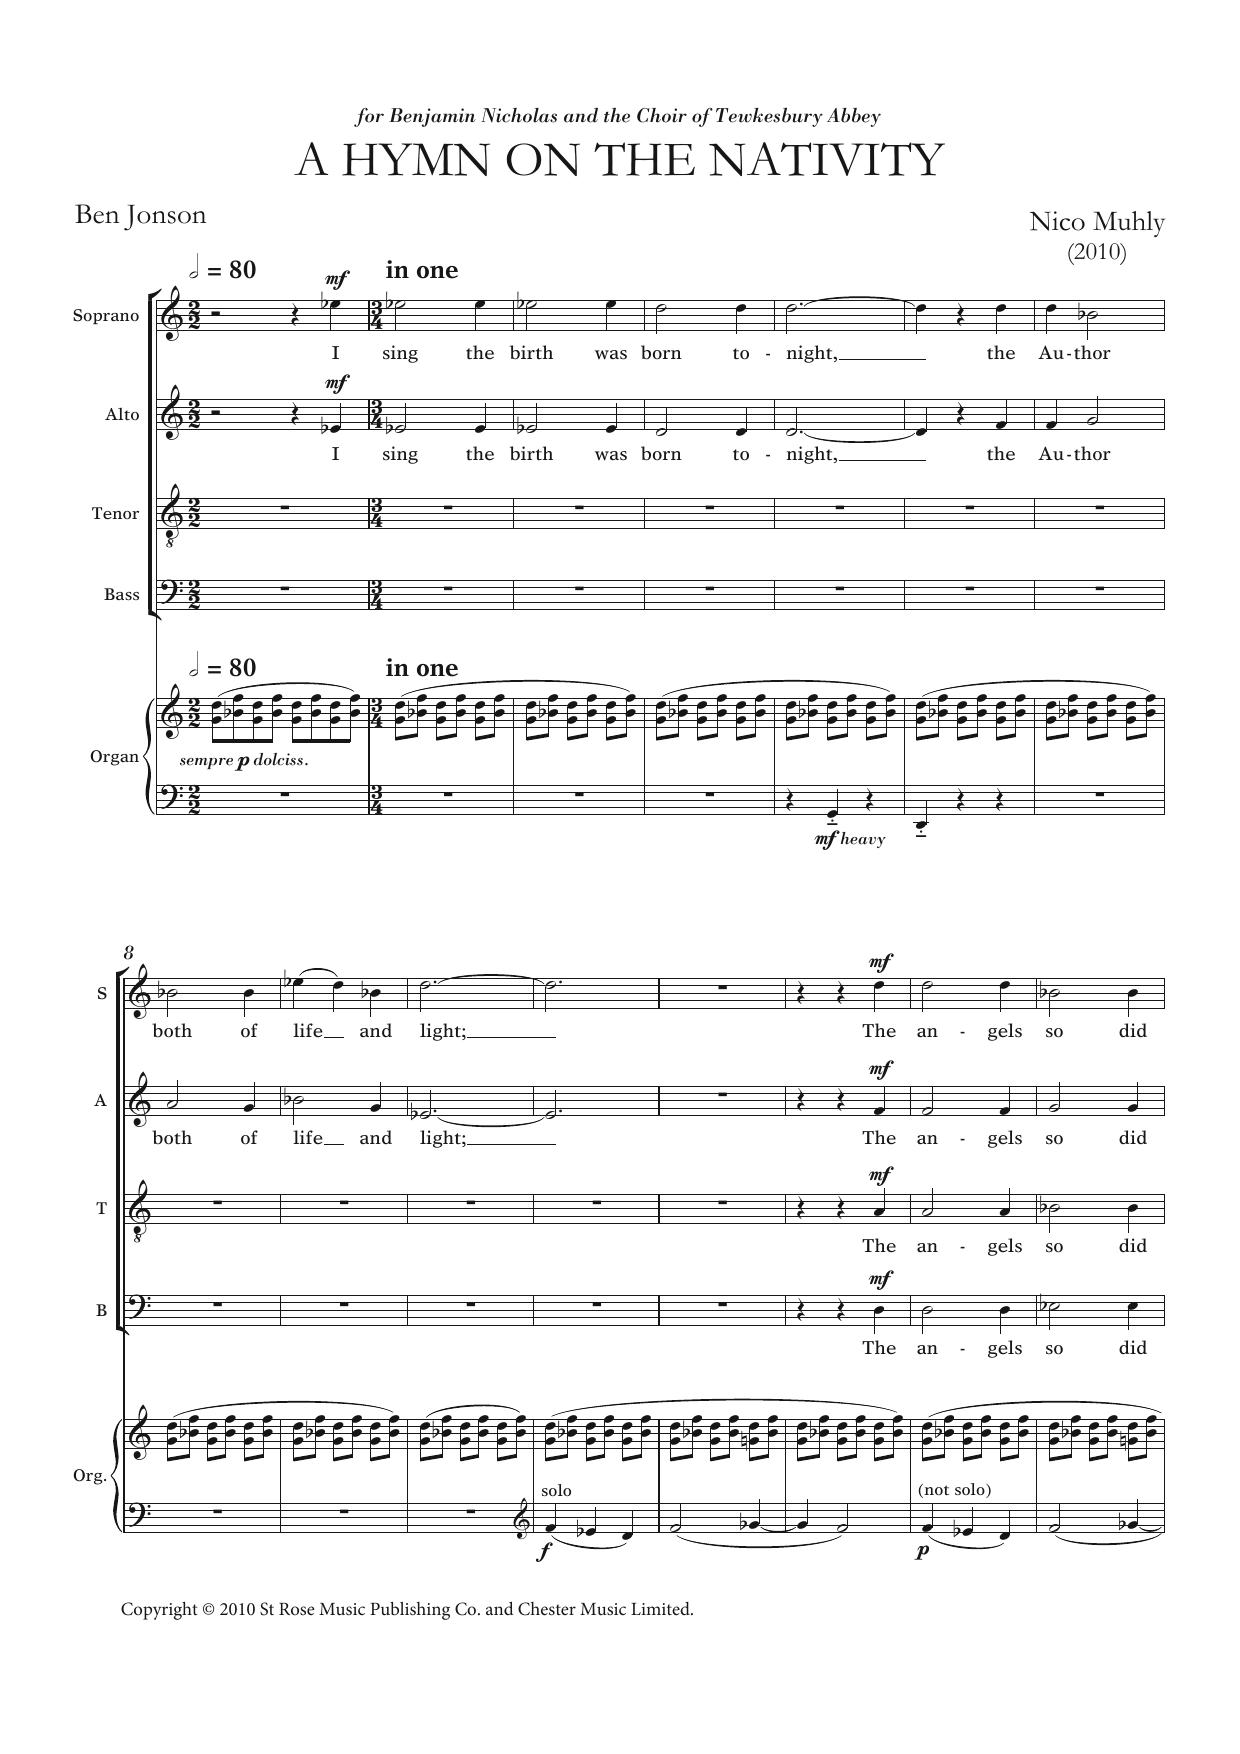 Sheet Music Digital Files To Print Licensed Choral Digital Sheet Music